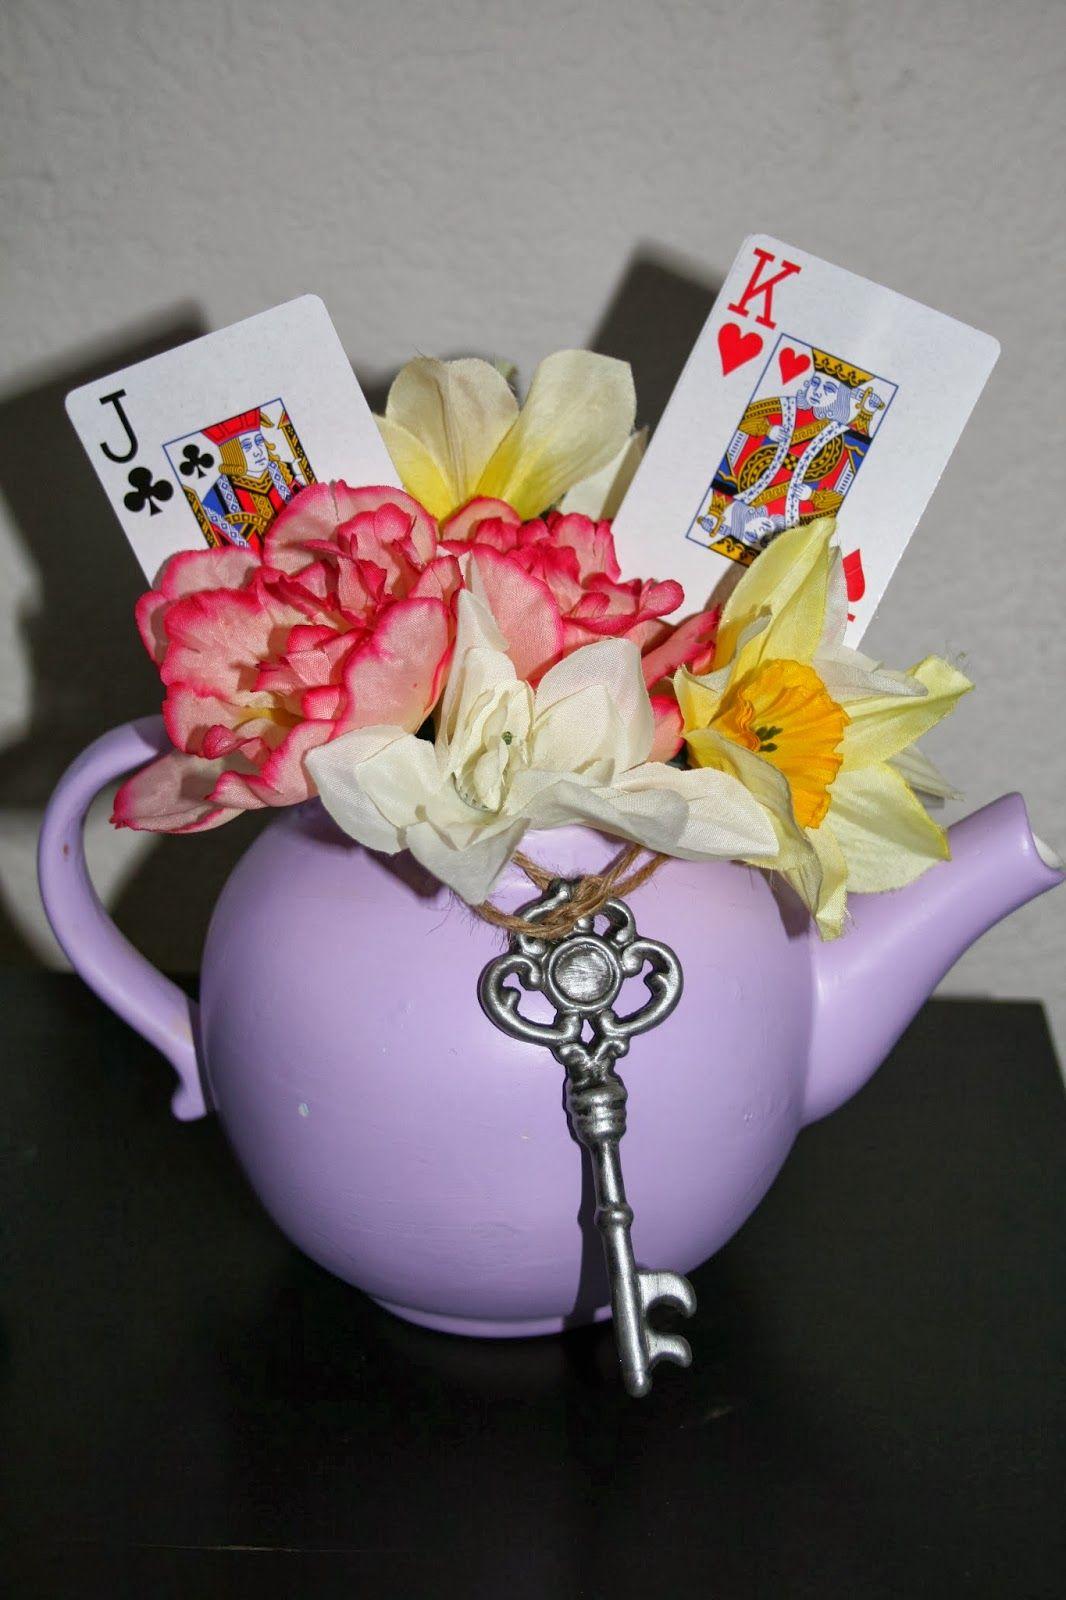 Alice In Wonderland Decorations Alice In Wonderland Centerpiece Alice In Wonderland Party Ideas